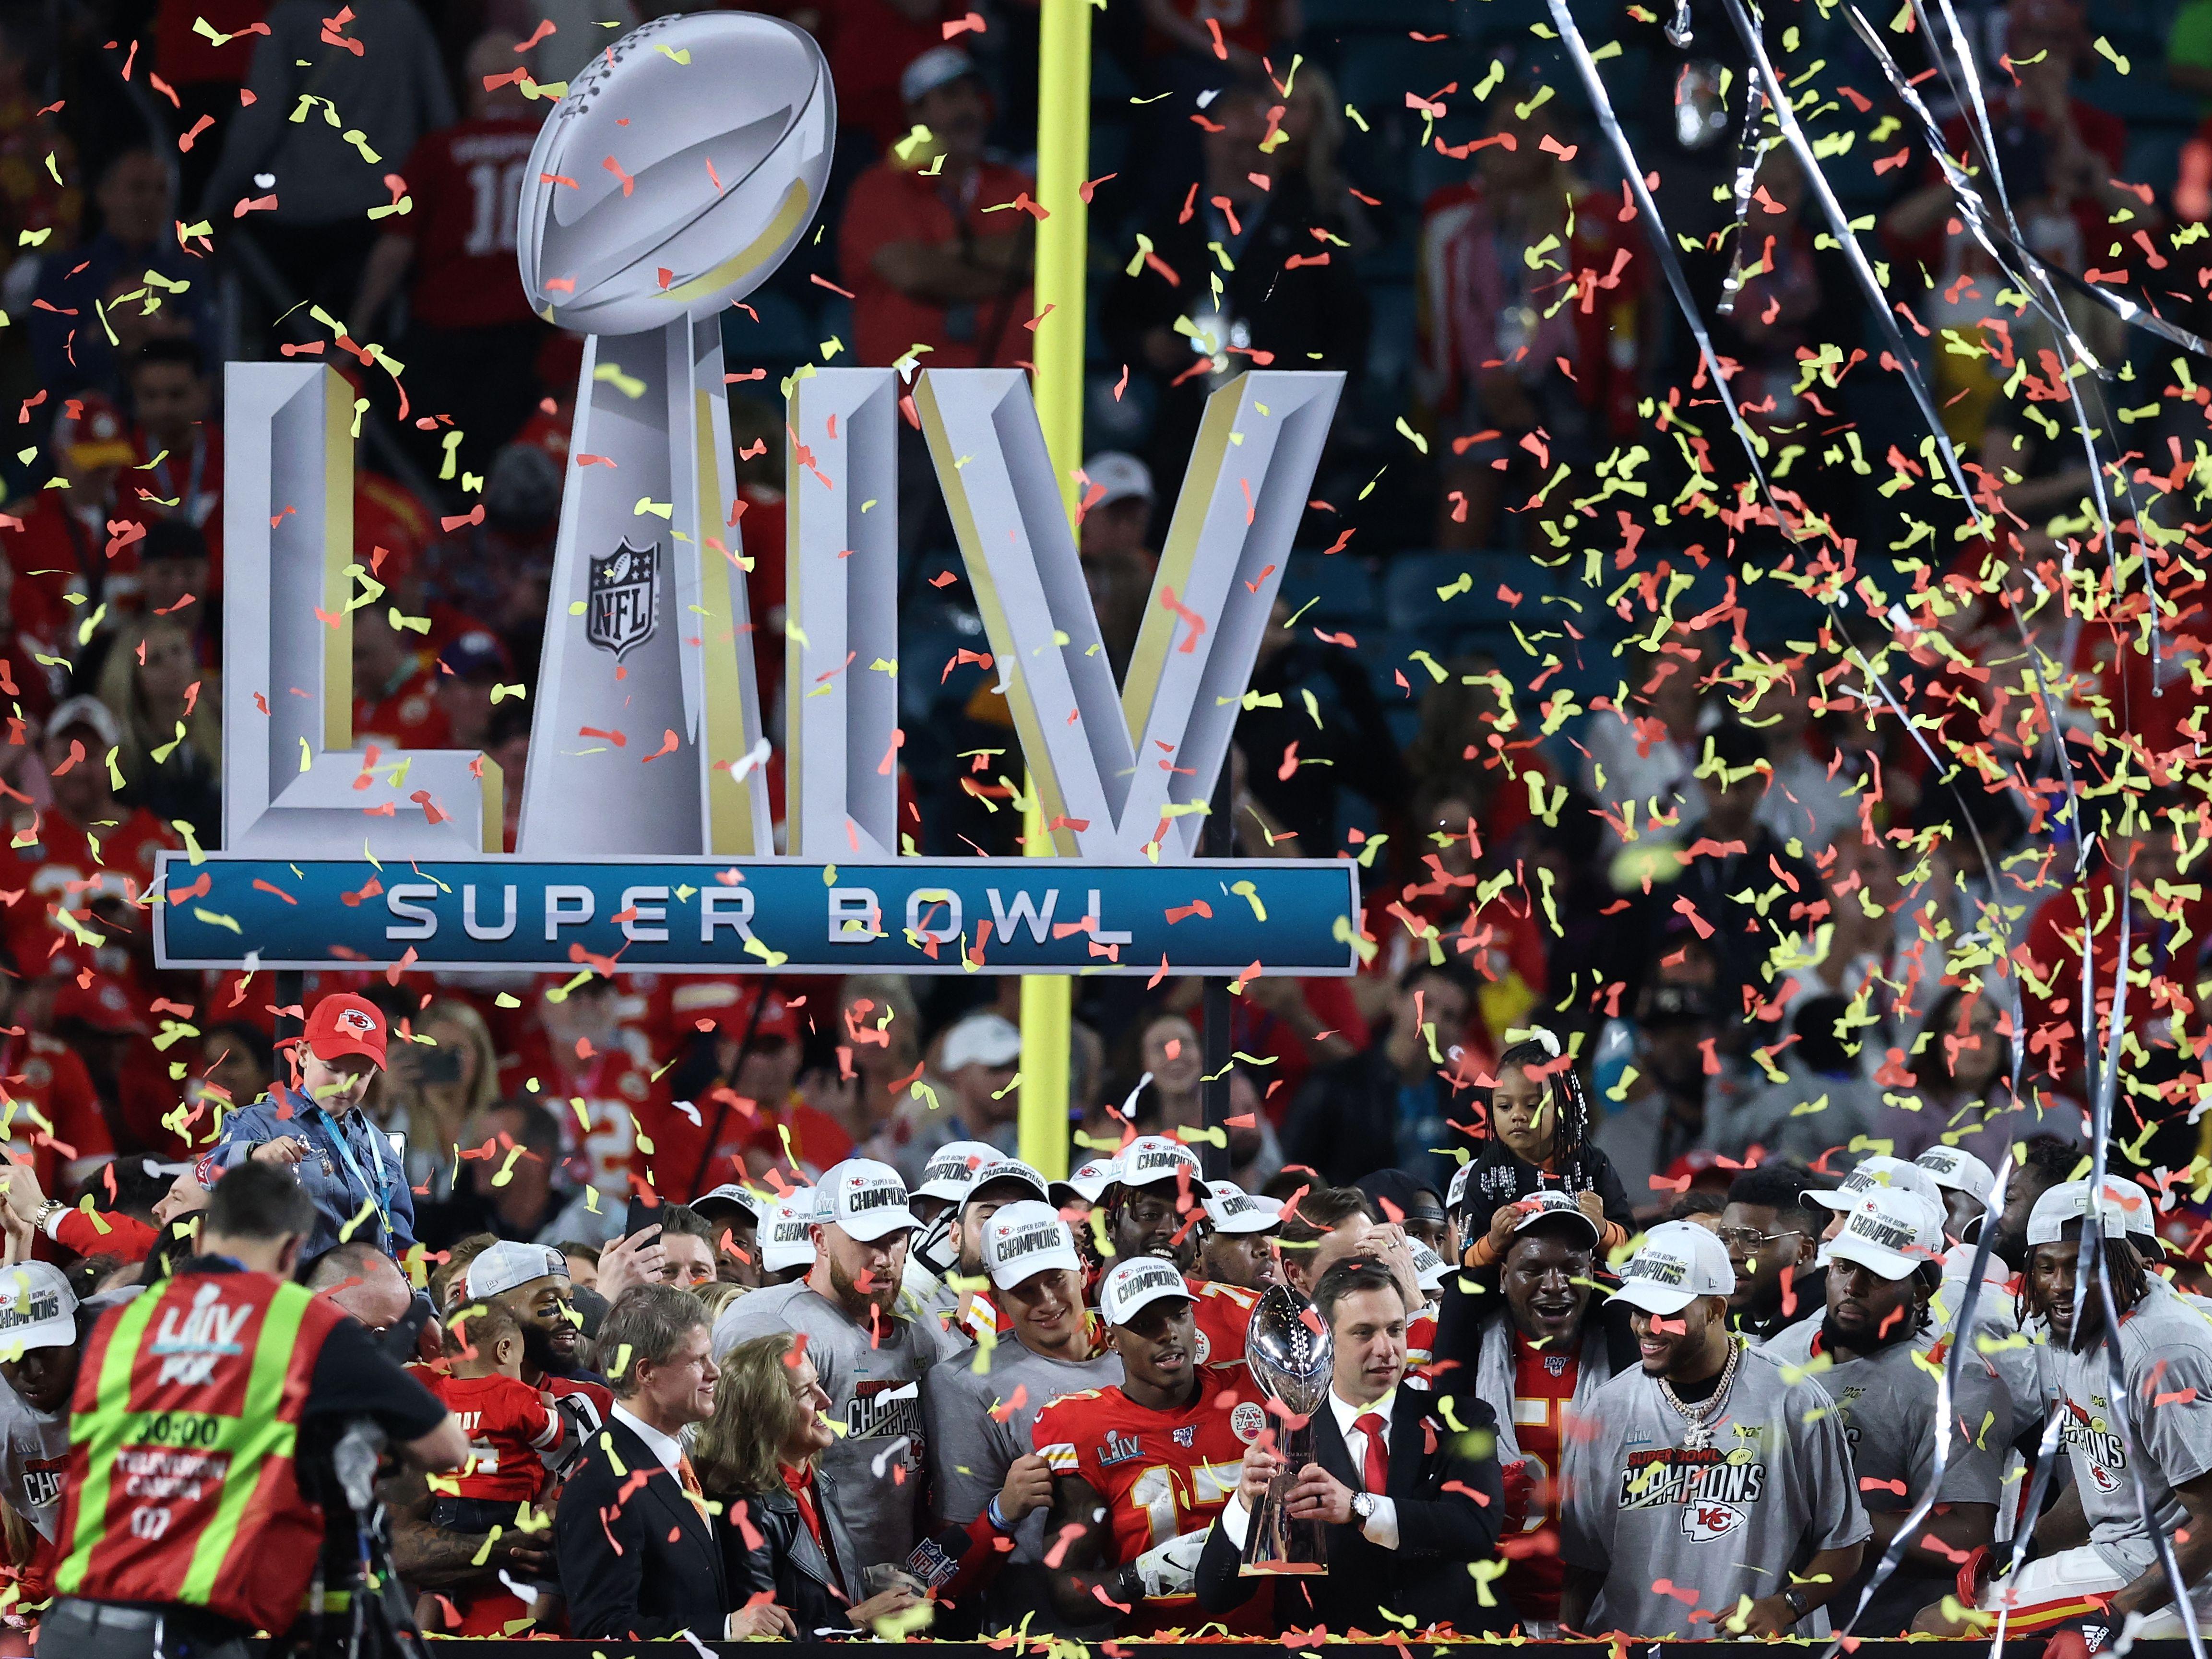 Kansas City Chiefs feiern den Gewinn von Super Bowl LIV (54).